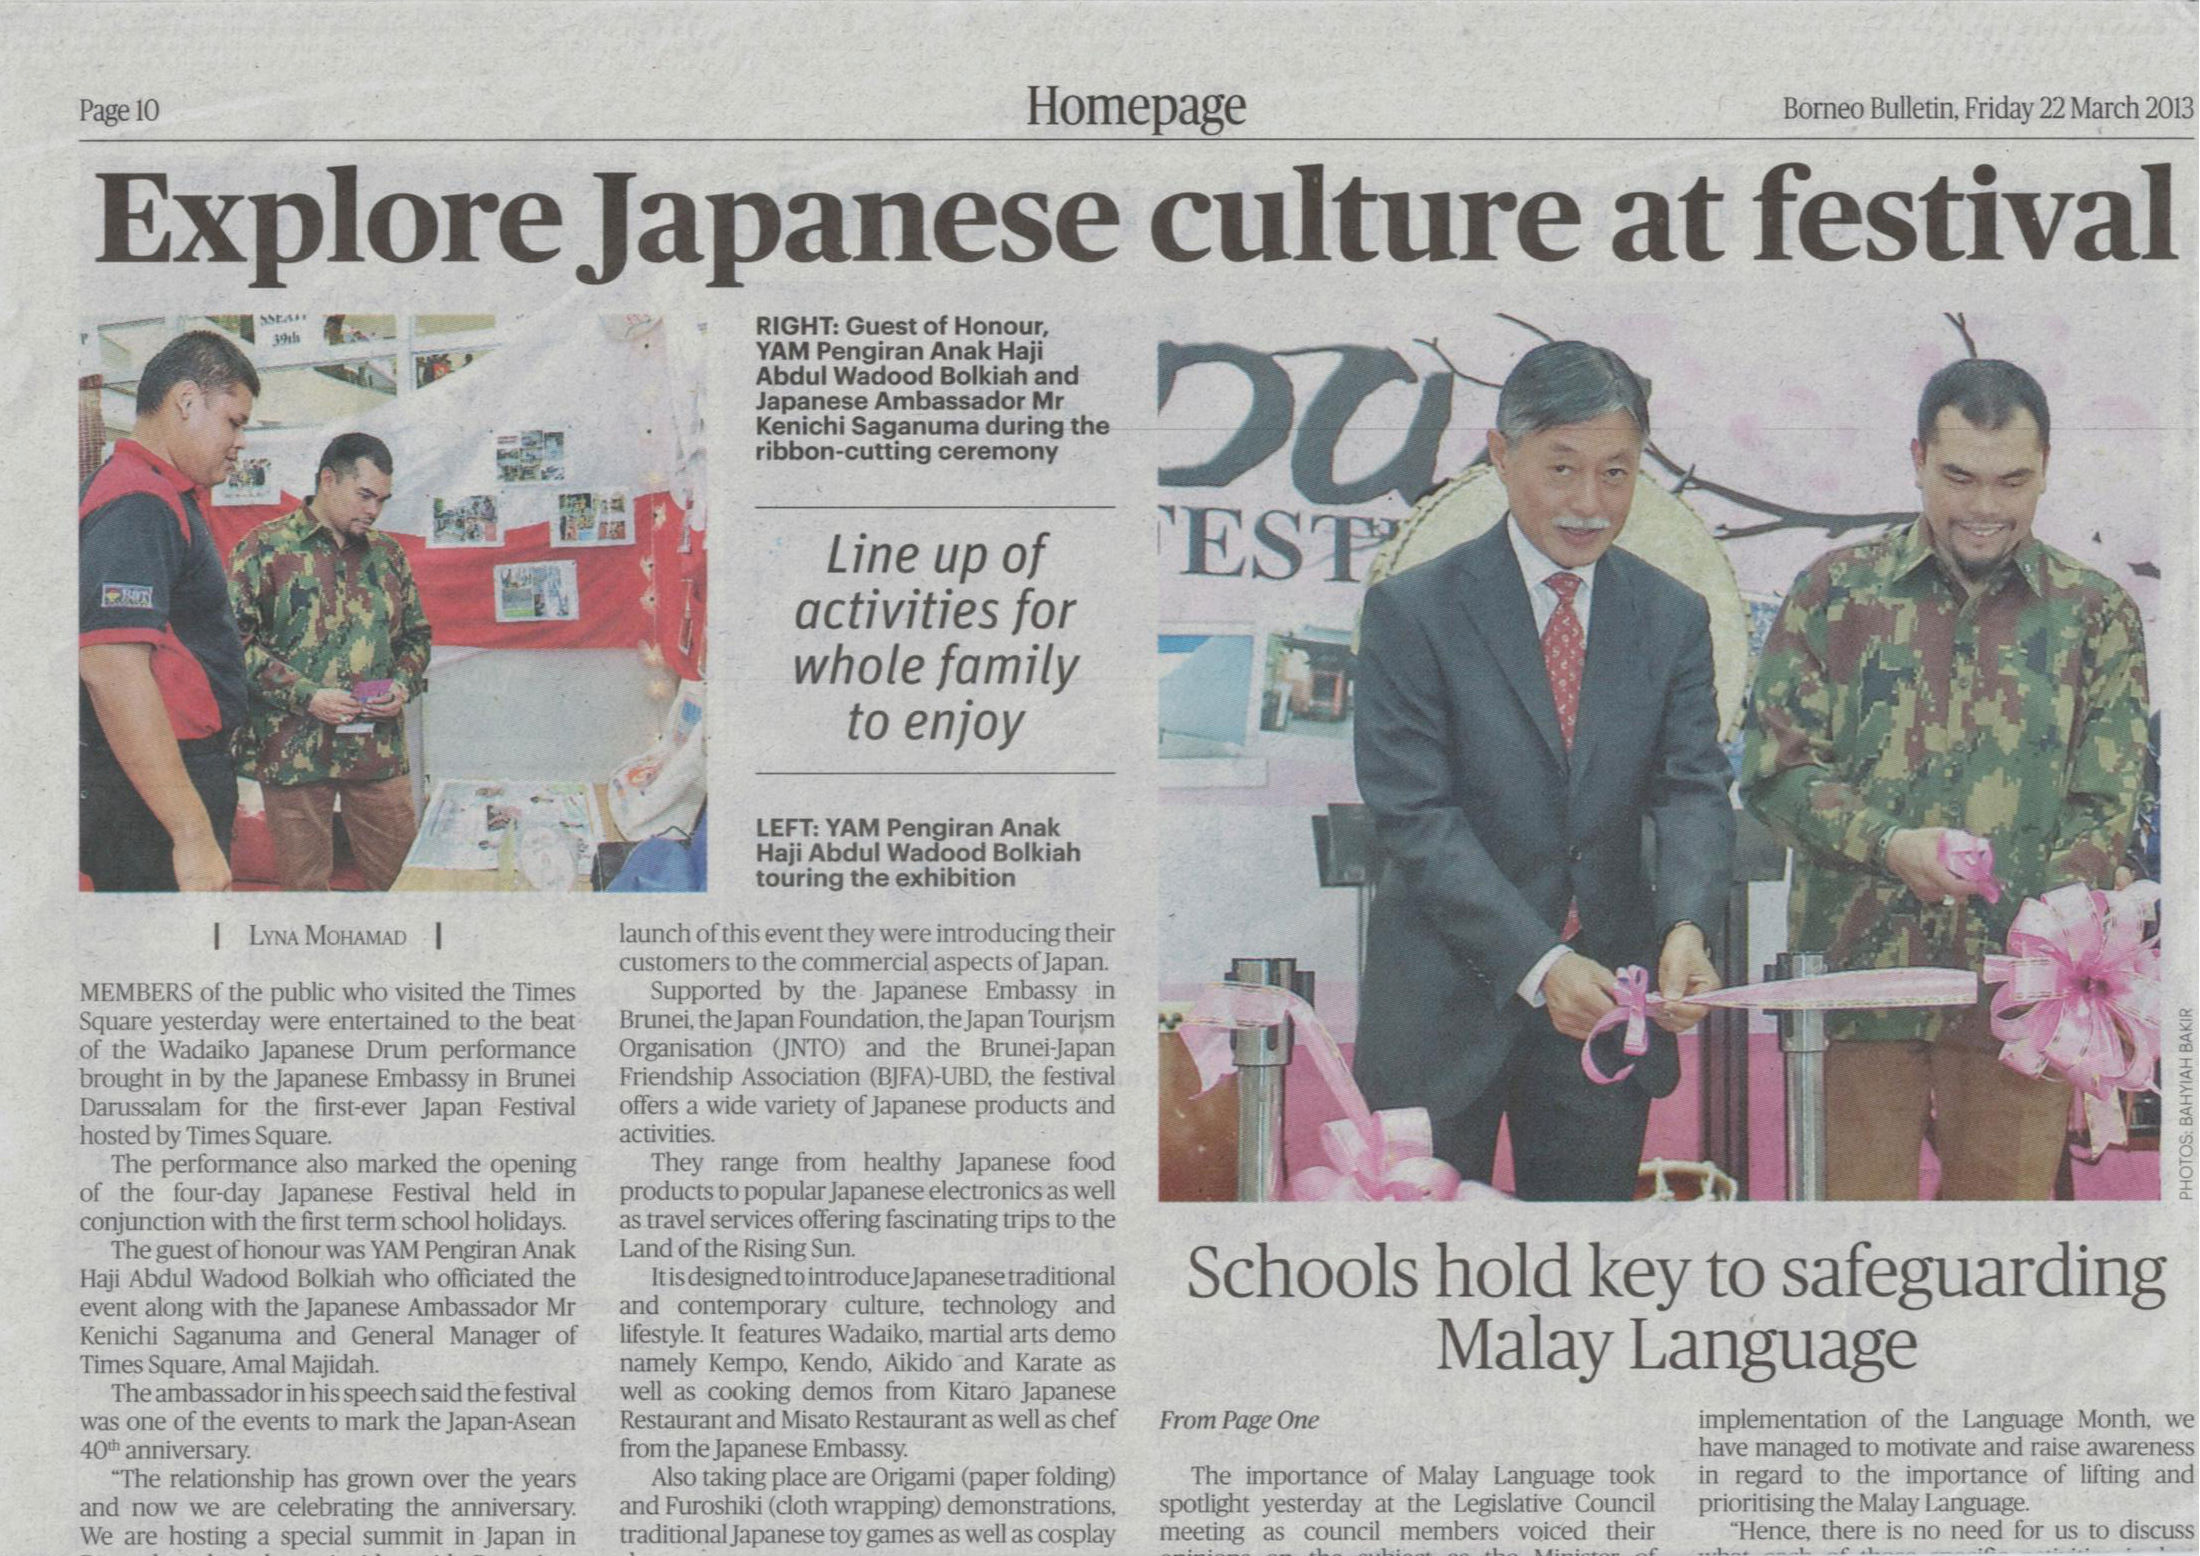 Borneo Bulletin Friday 22 March 2013